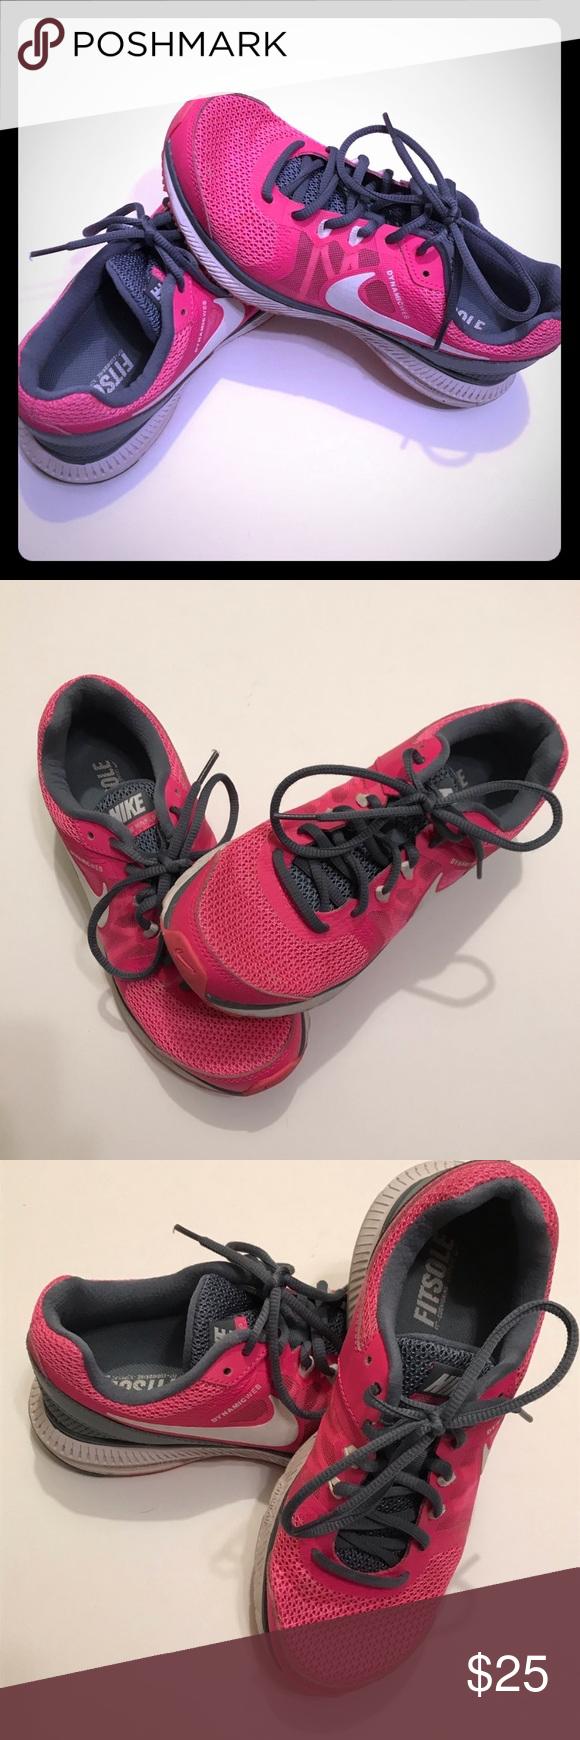 Photo of Nike Lunar Glide Running Shoes Nike Lunar Glide Running Shoes Gently used with r…